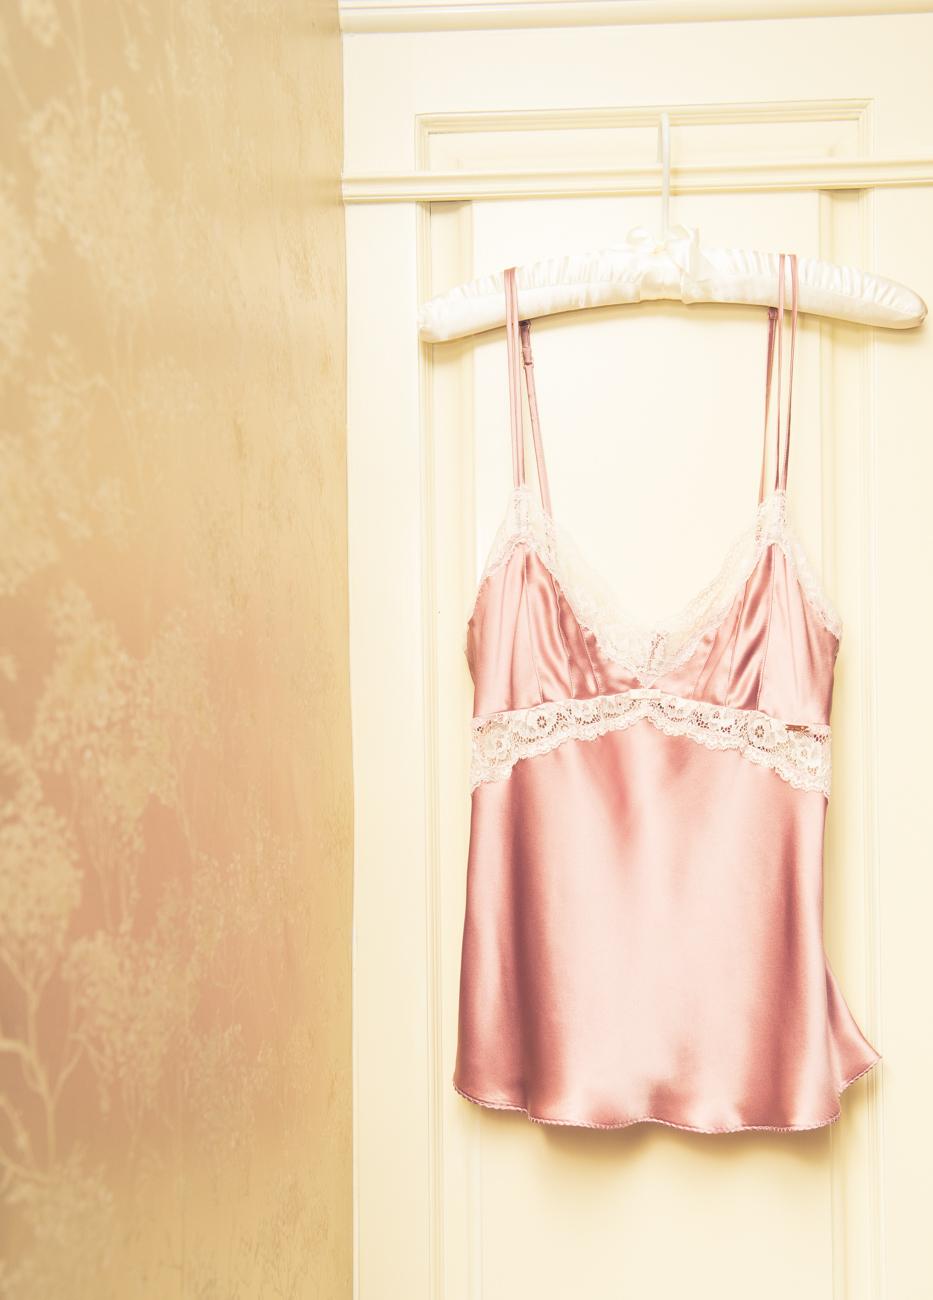 Rosie Huntington為英國老牌商店Marks&Spence所設計的性感內衣系列。